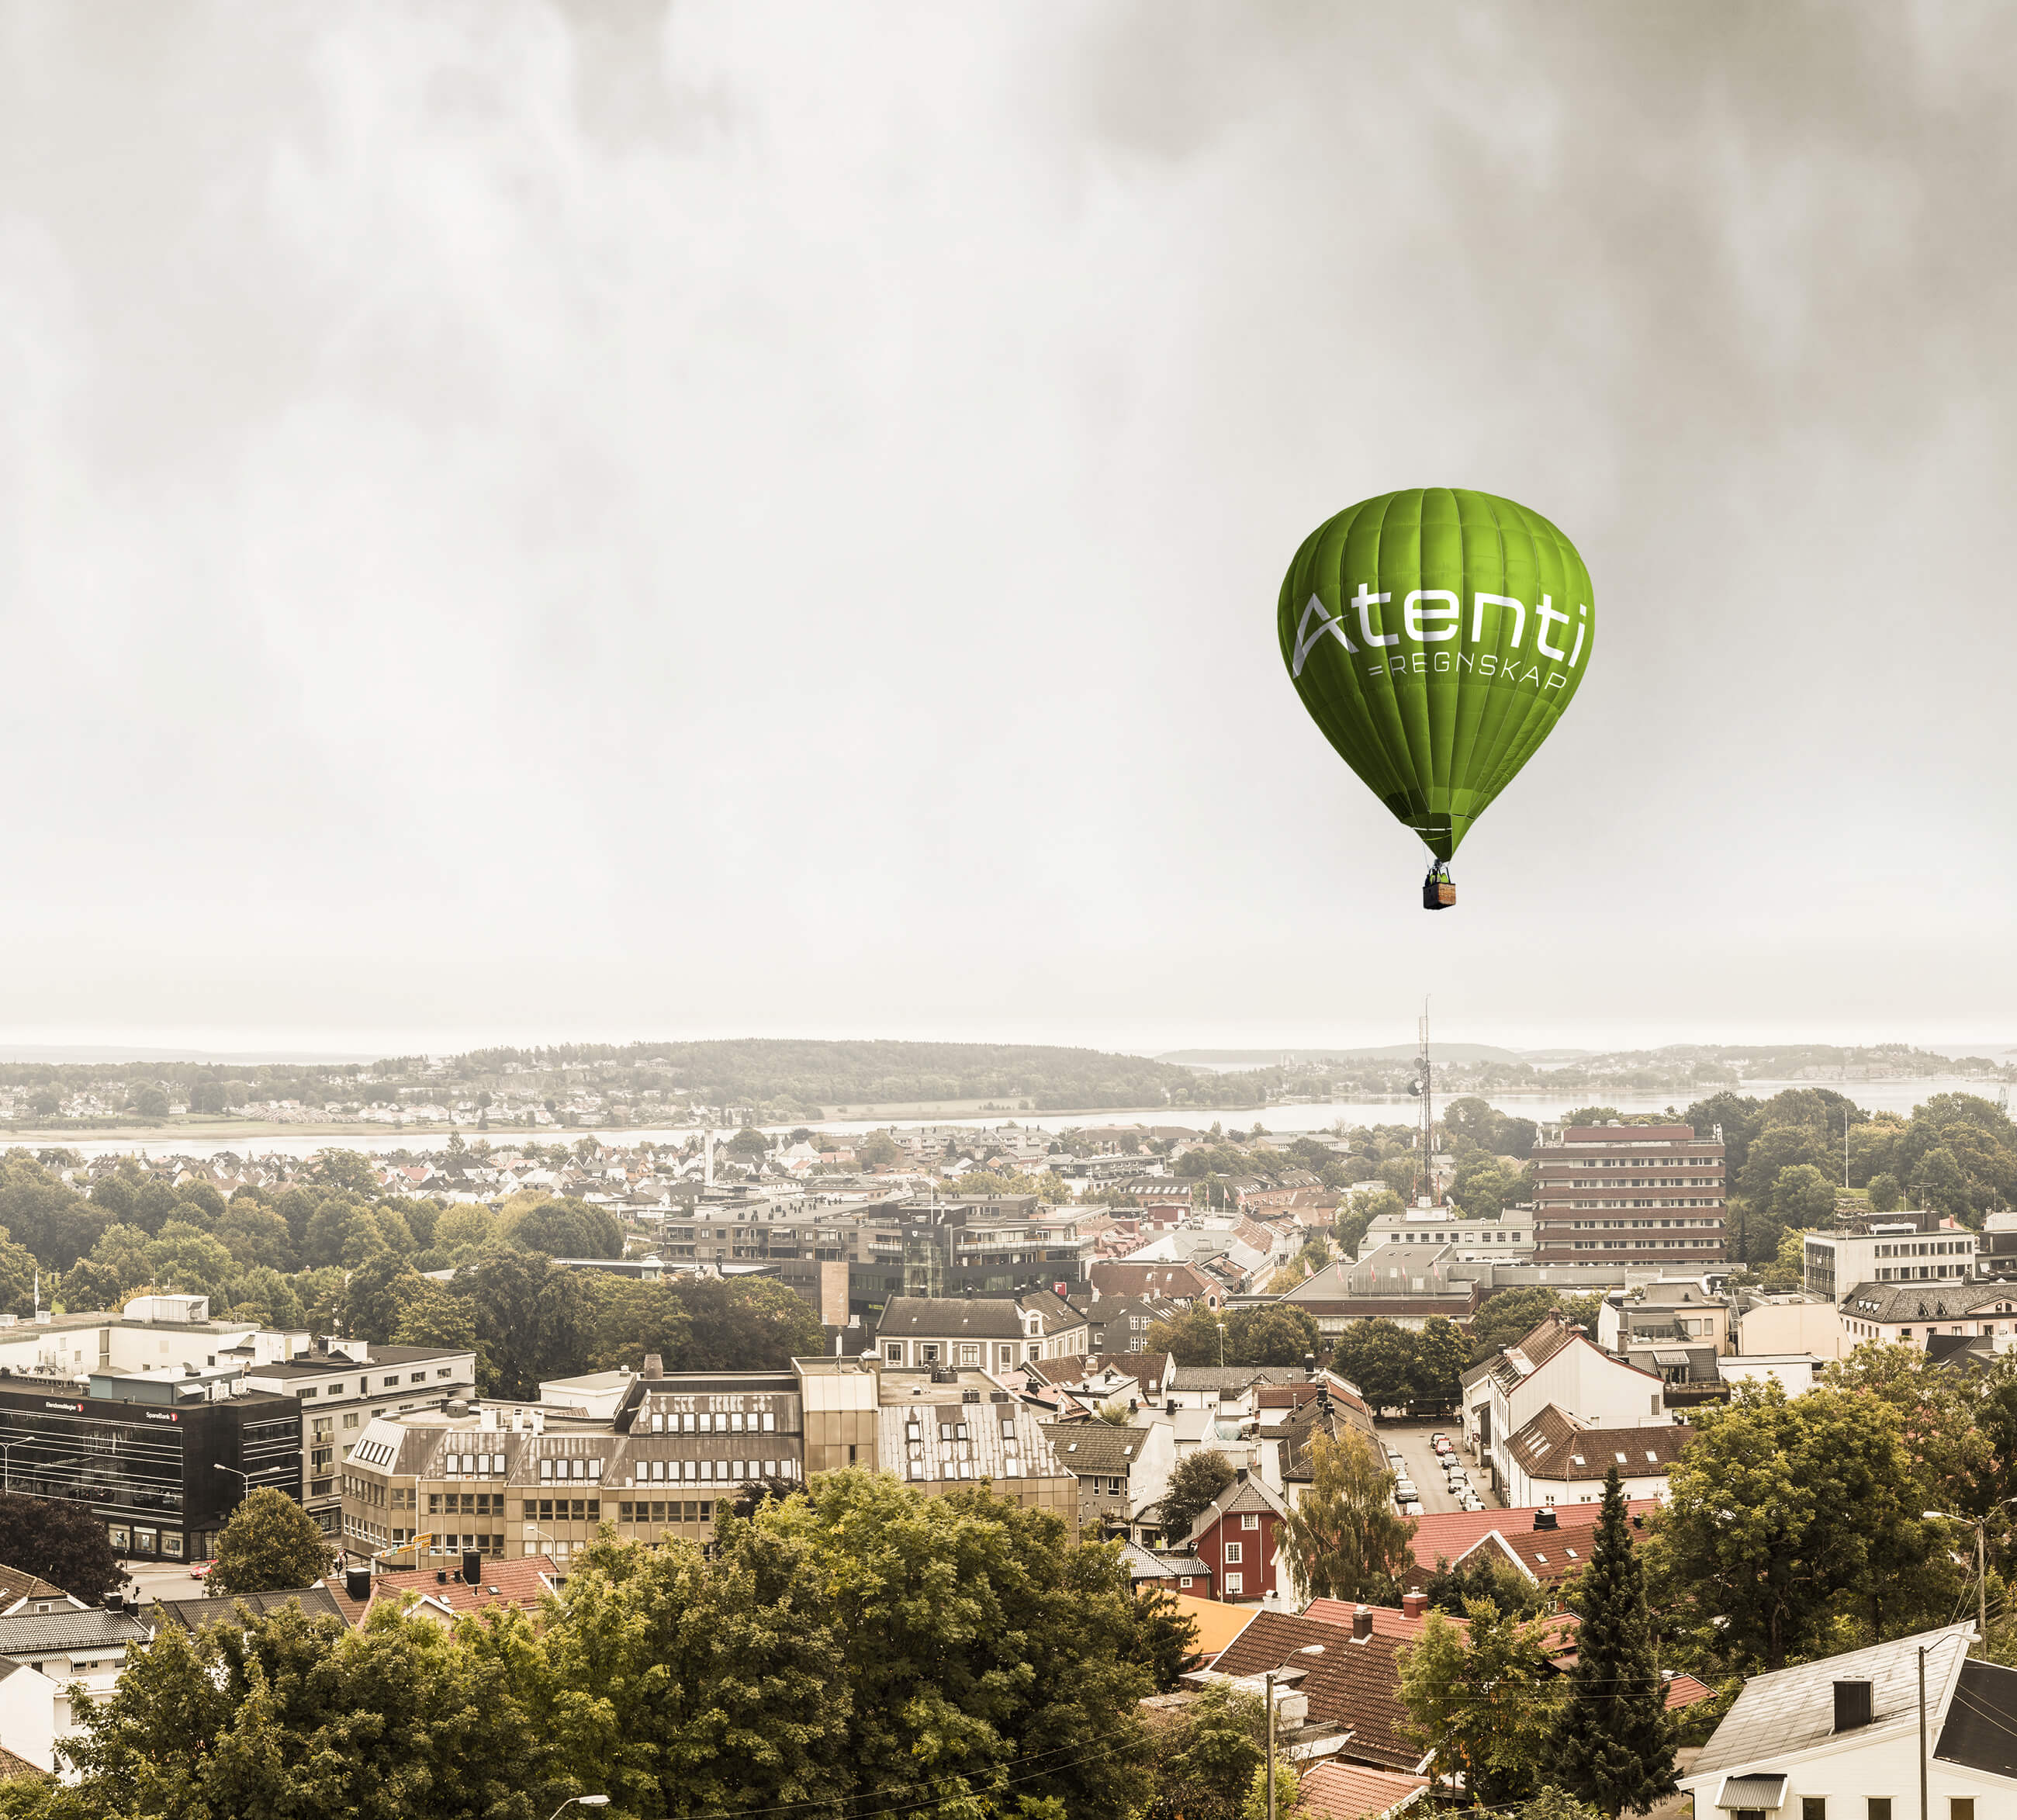 Atenti ballong over Tønsberg